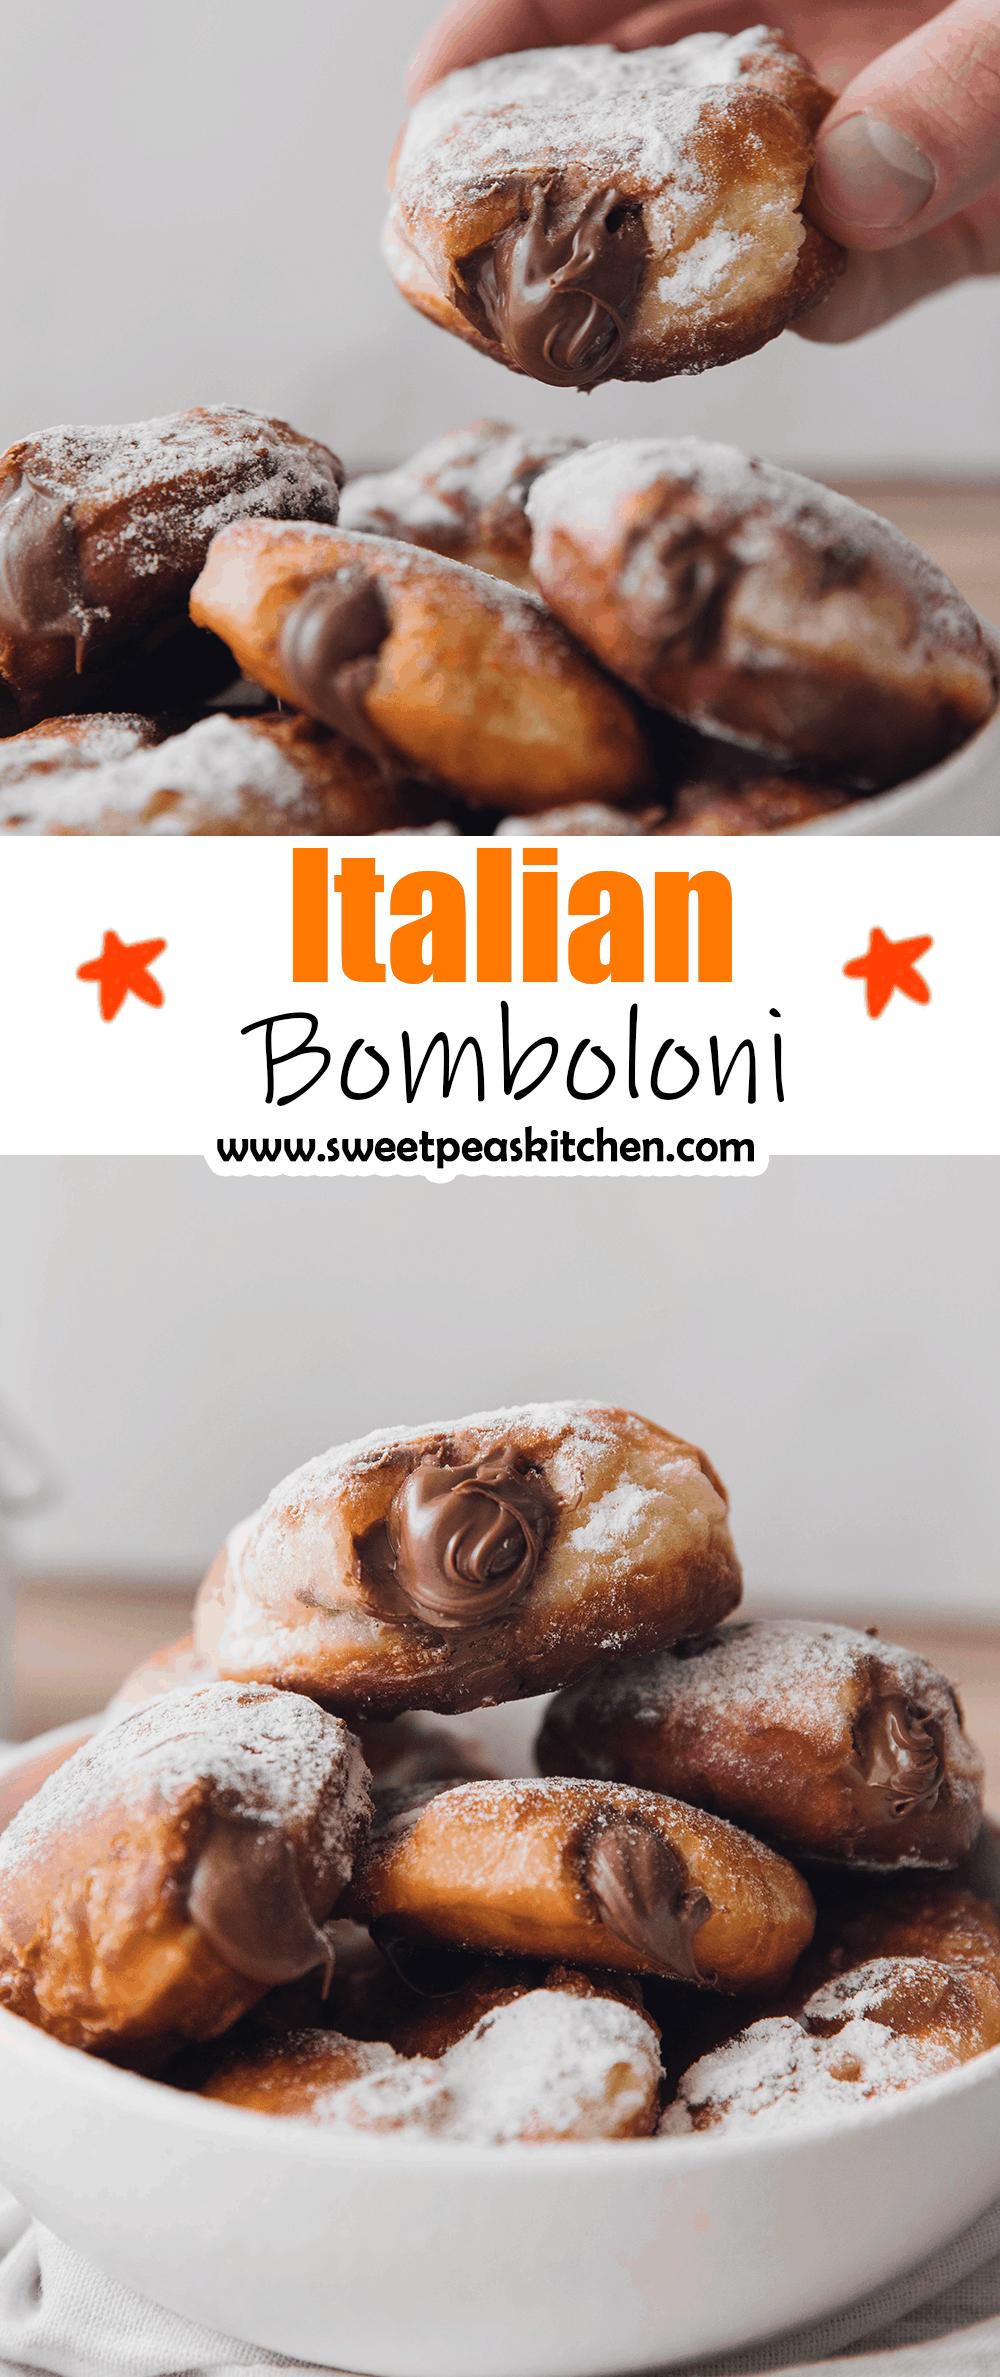 Italian Bomboloni